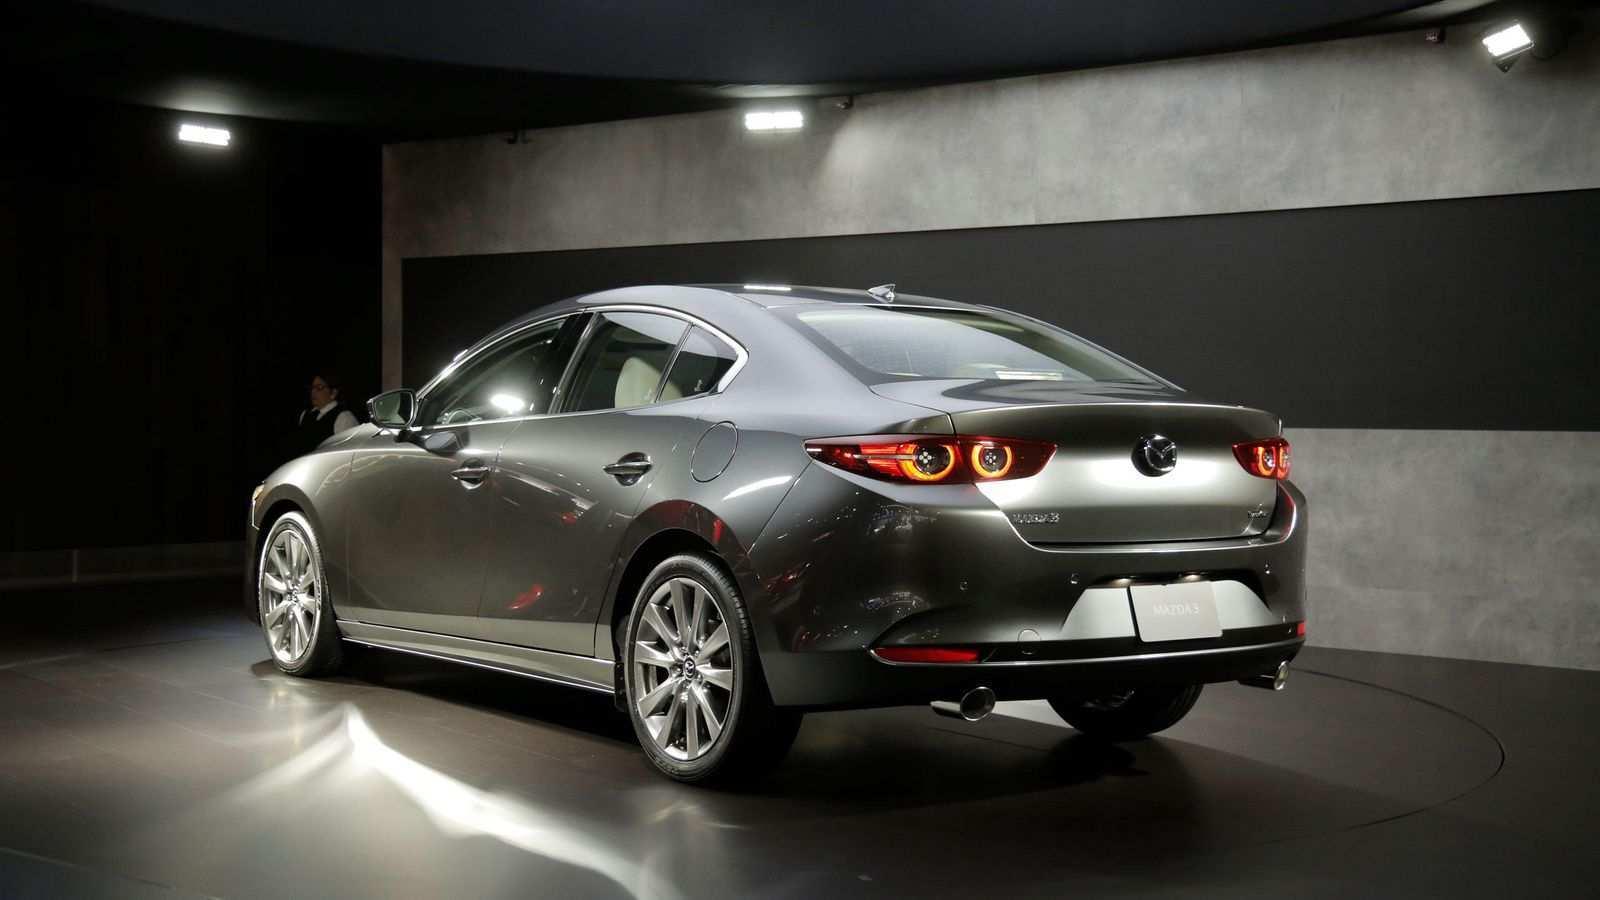 89 Gallery of Mazda 2020 Carplay Engine for Mazda 2020 Carplay